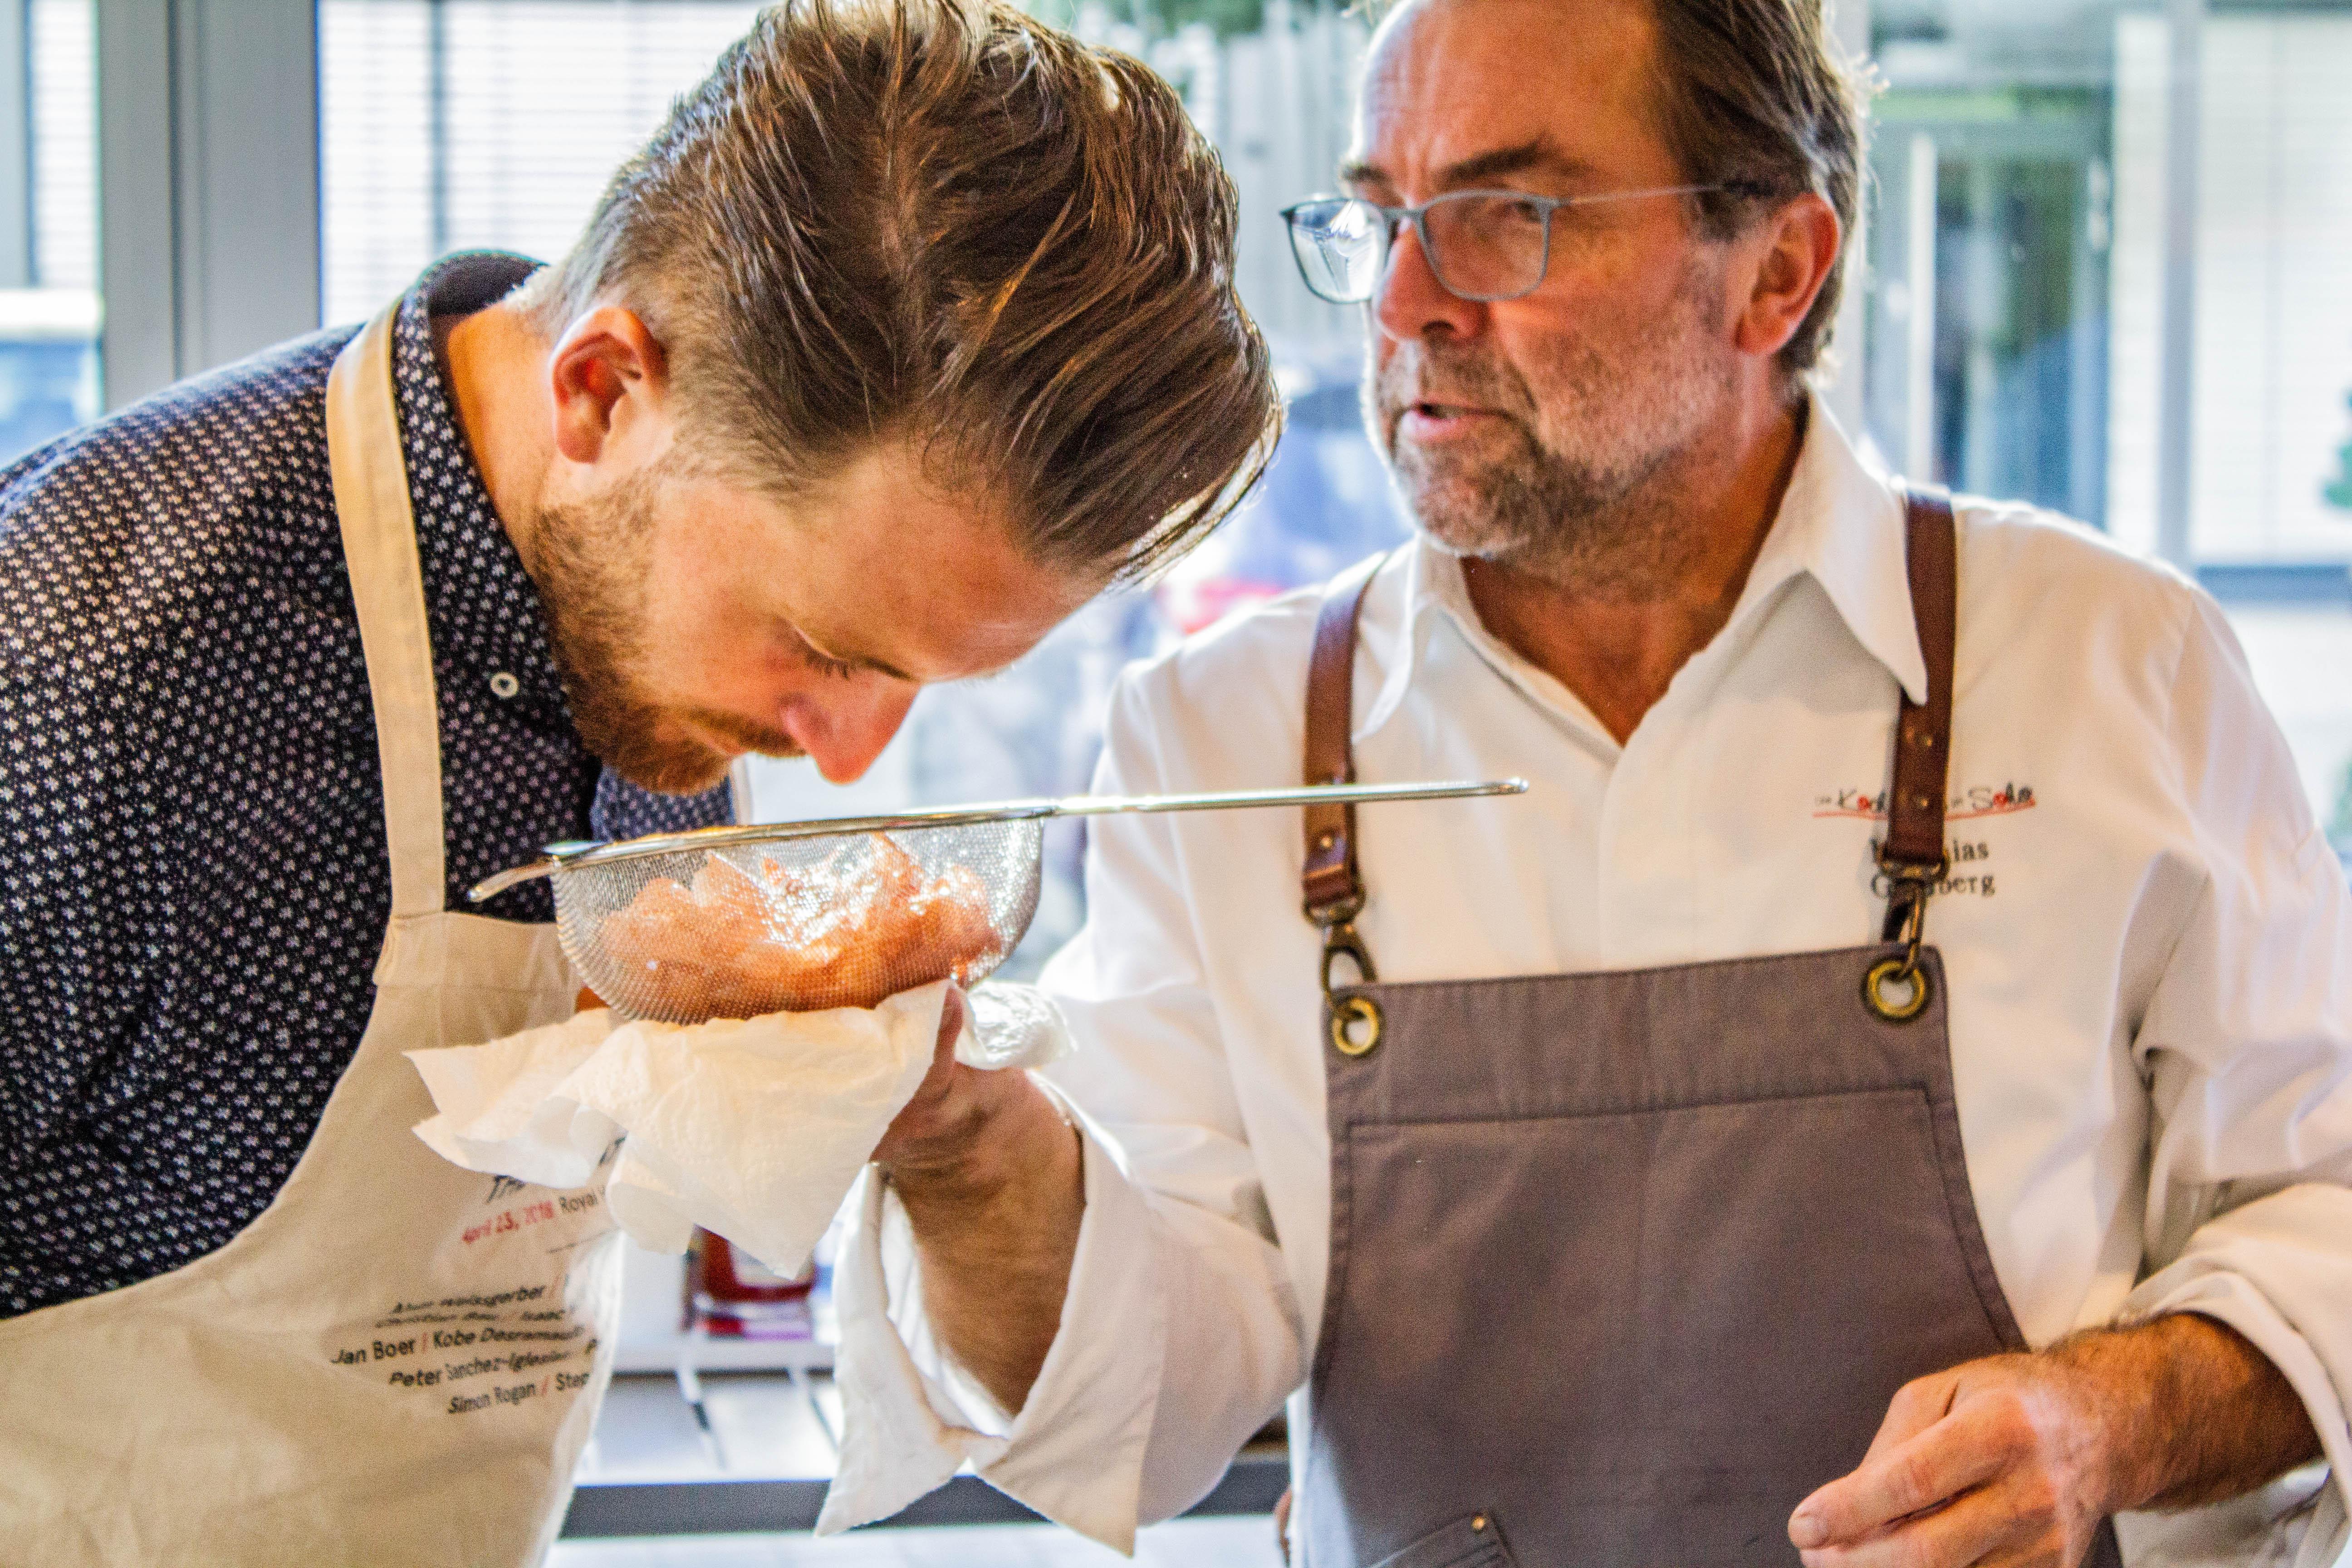 Chef Kochkurs - ABGESAGT #CORONA